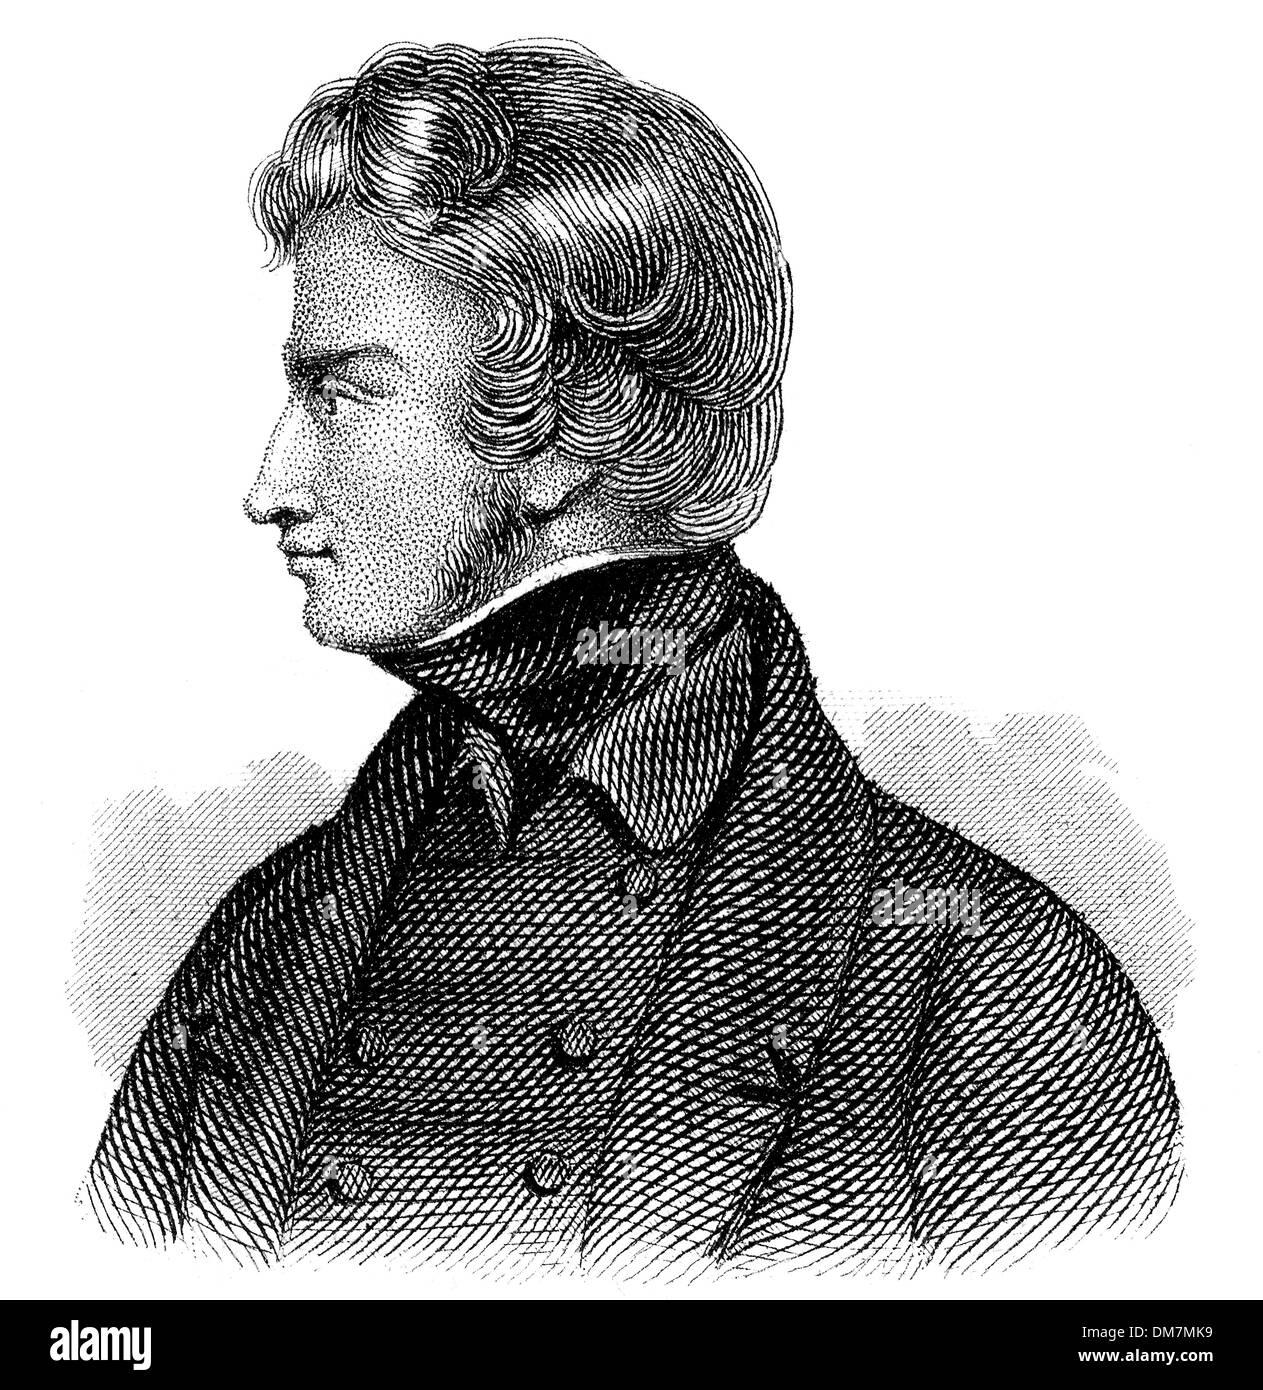 Adam Bernard Mickiewicz, 1798 - 1855, Polish national poet, publicist, translator, - Stock Image